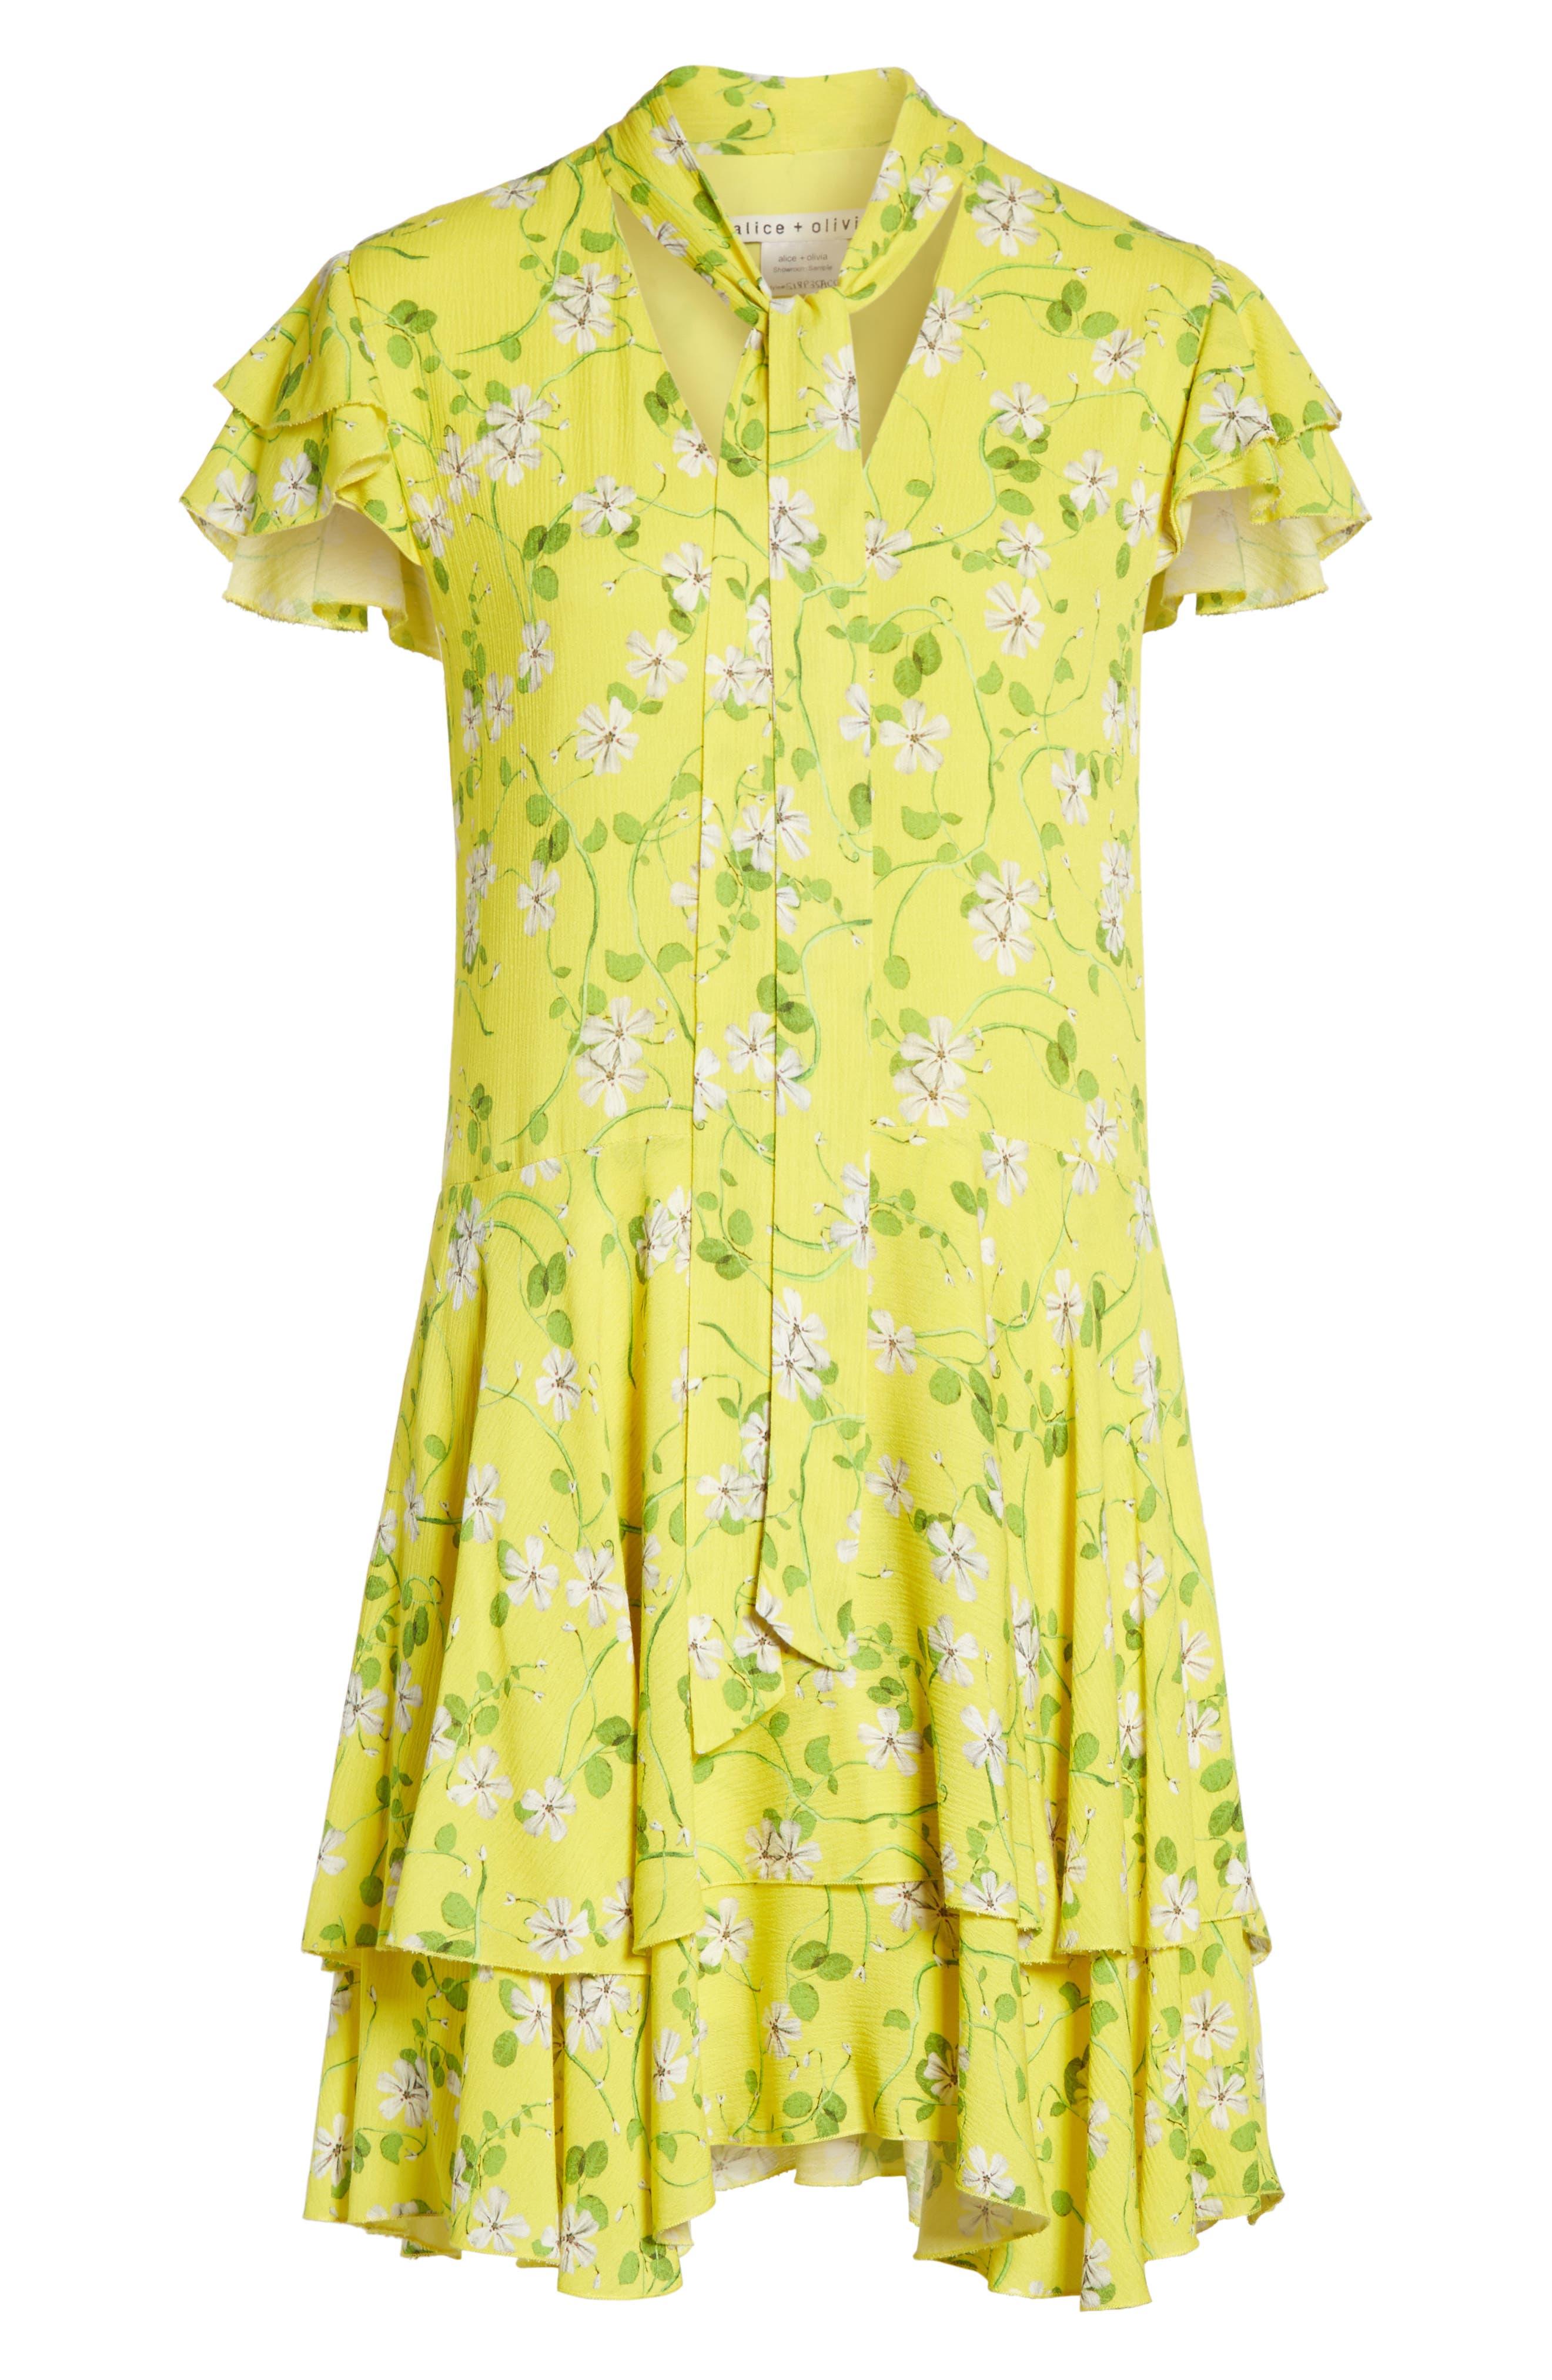 Moore Flutter Sleeve Layered Tunic Dress,                             Alternate thumbnail 6, color,                             Spring Primrose-Lemon